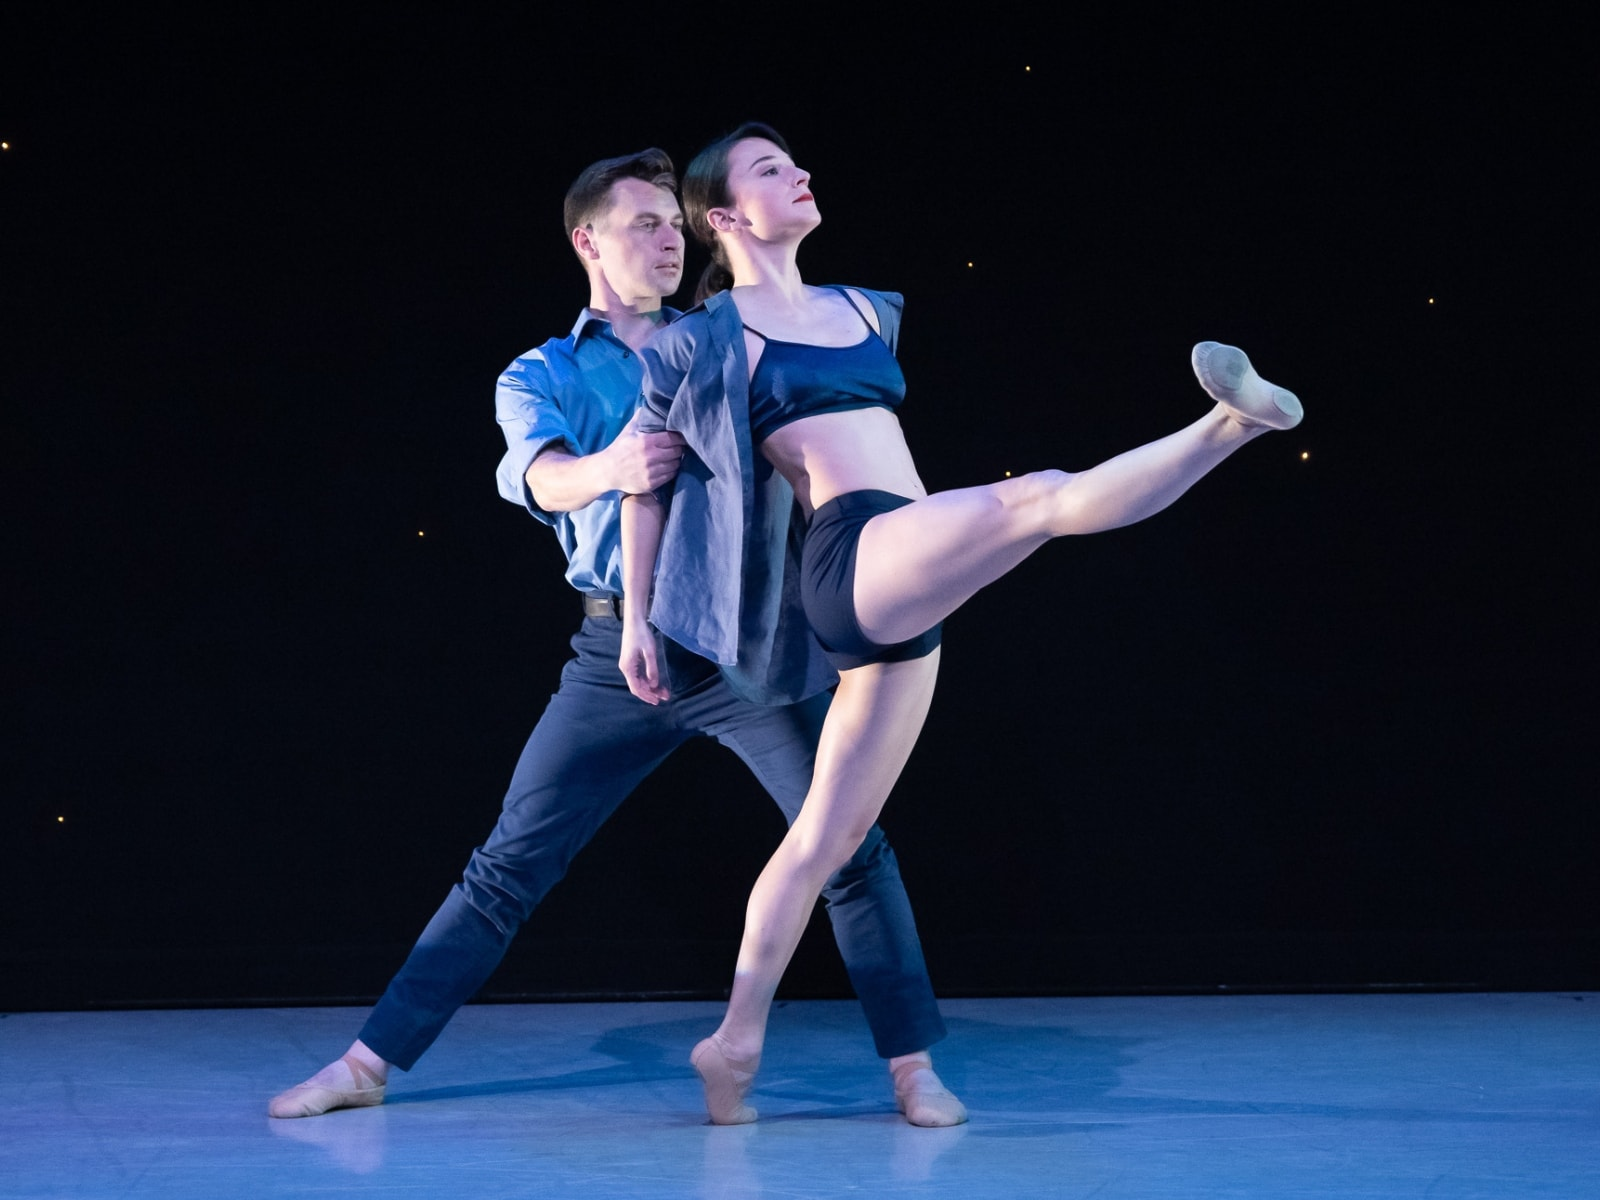 Terez and John dancing together.